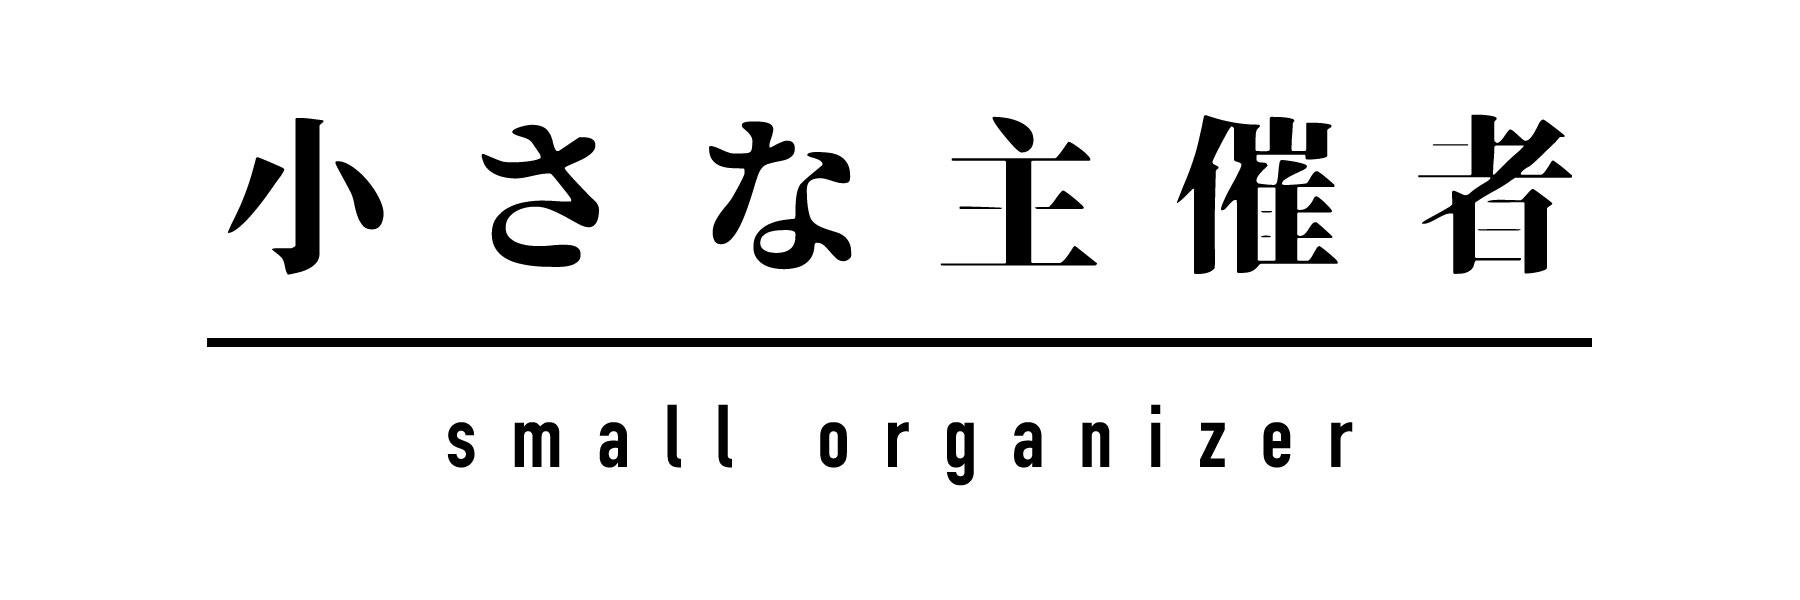 smallorganizer_logo